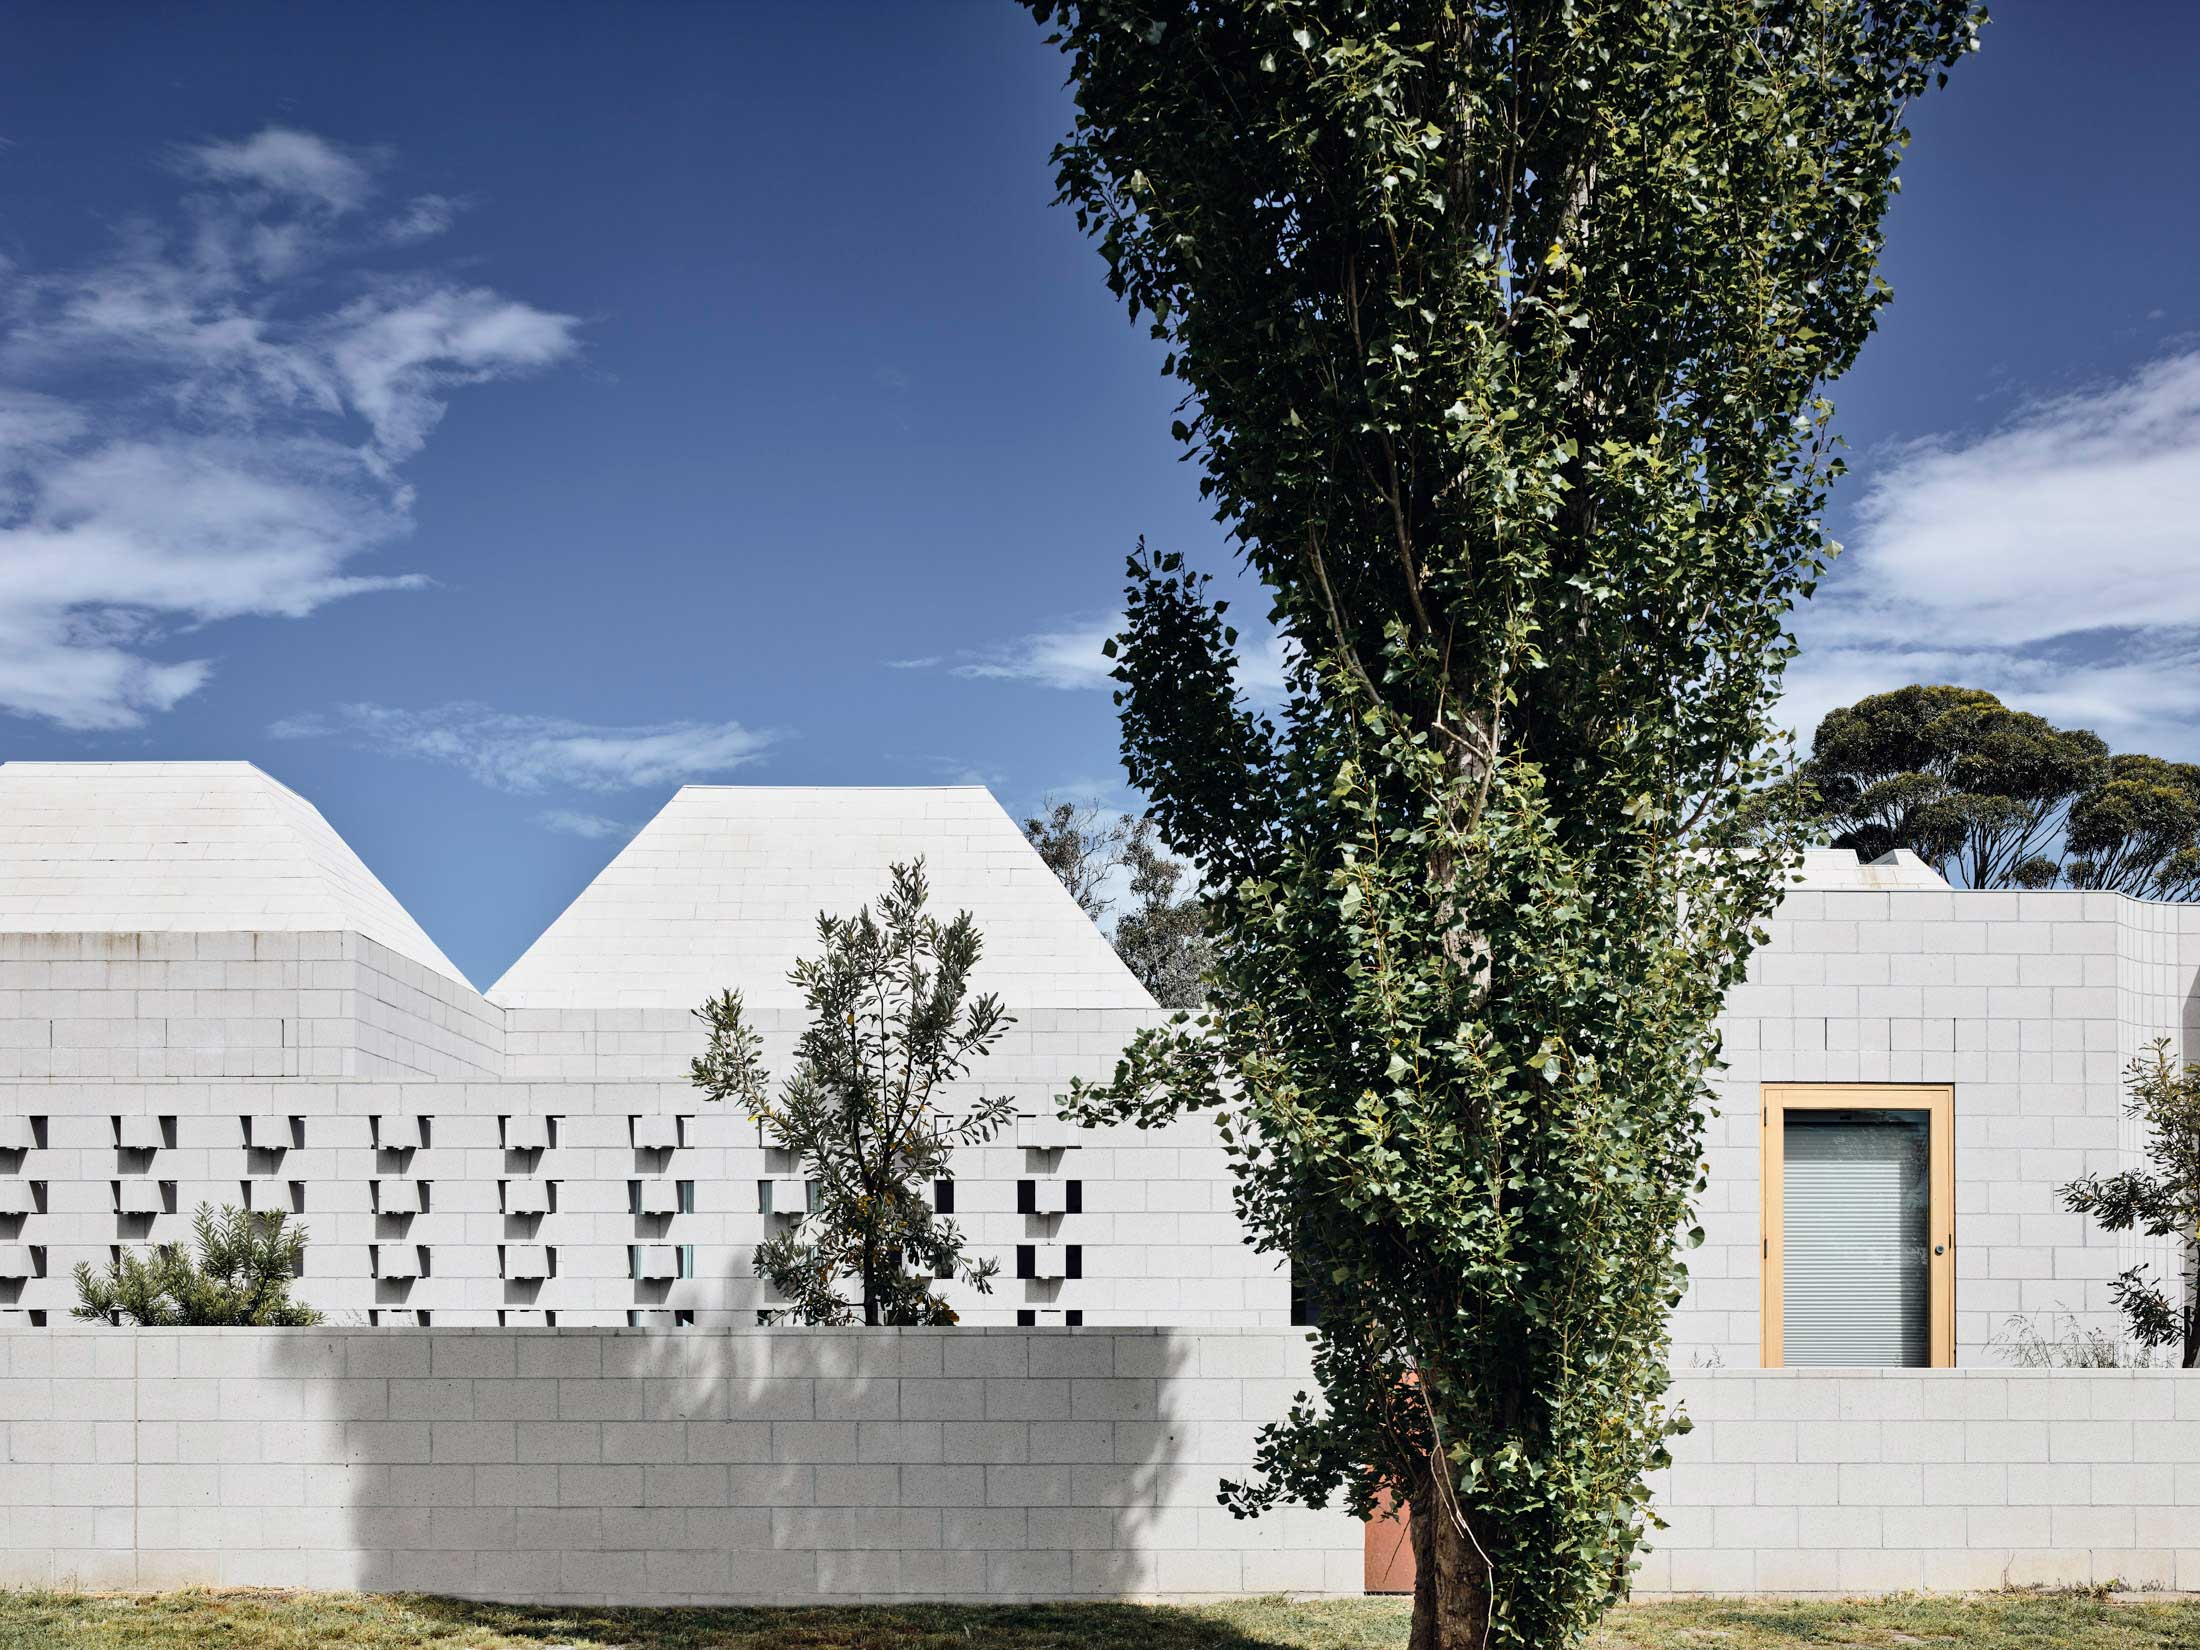 Architects Eat Bellows Beach House Flinders Masonry Architecture Photo Derek Swalwell Yellowtrace 01